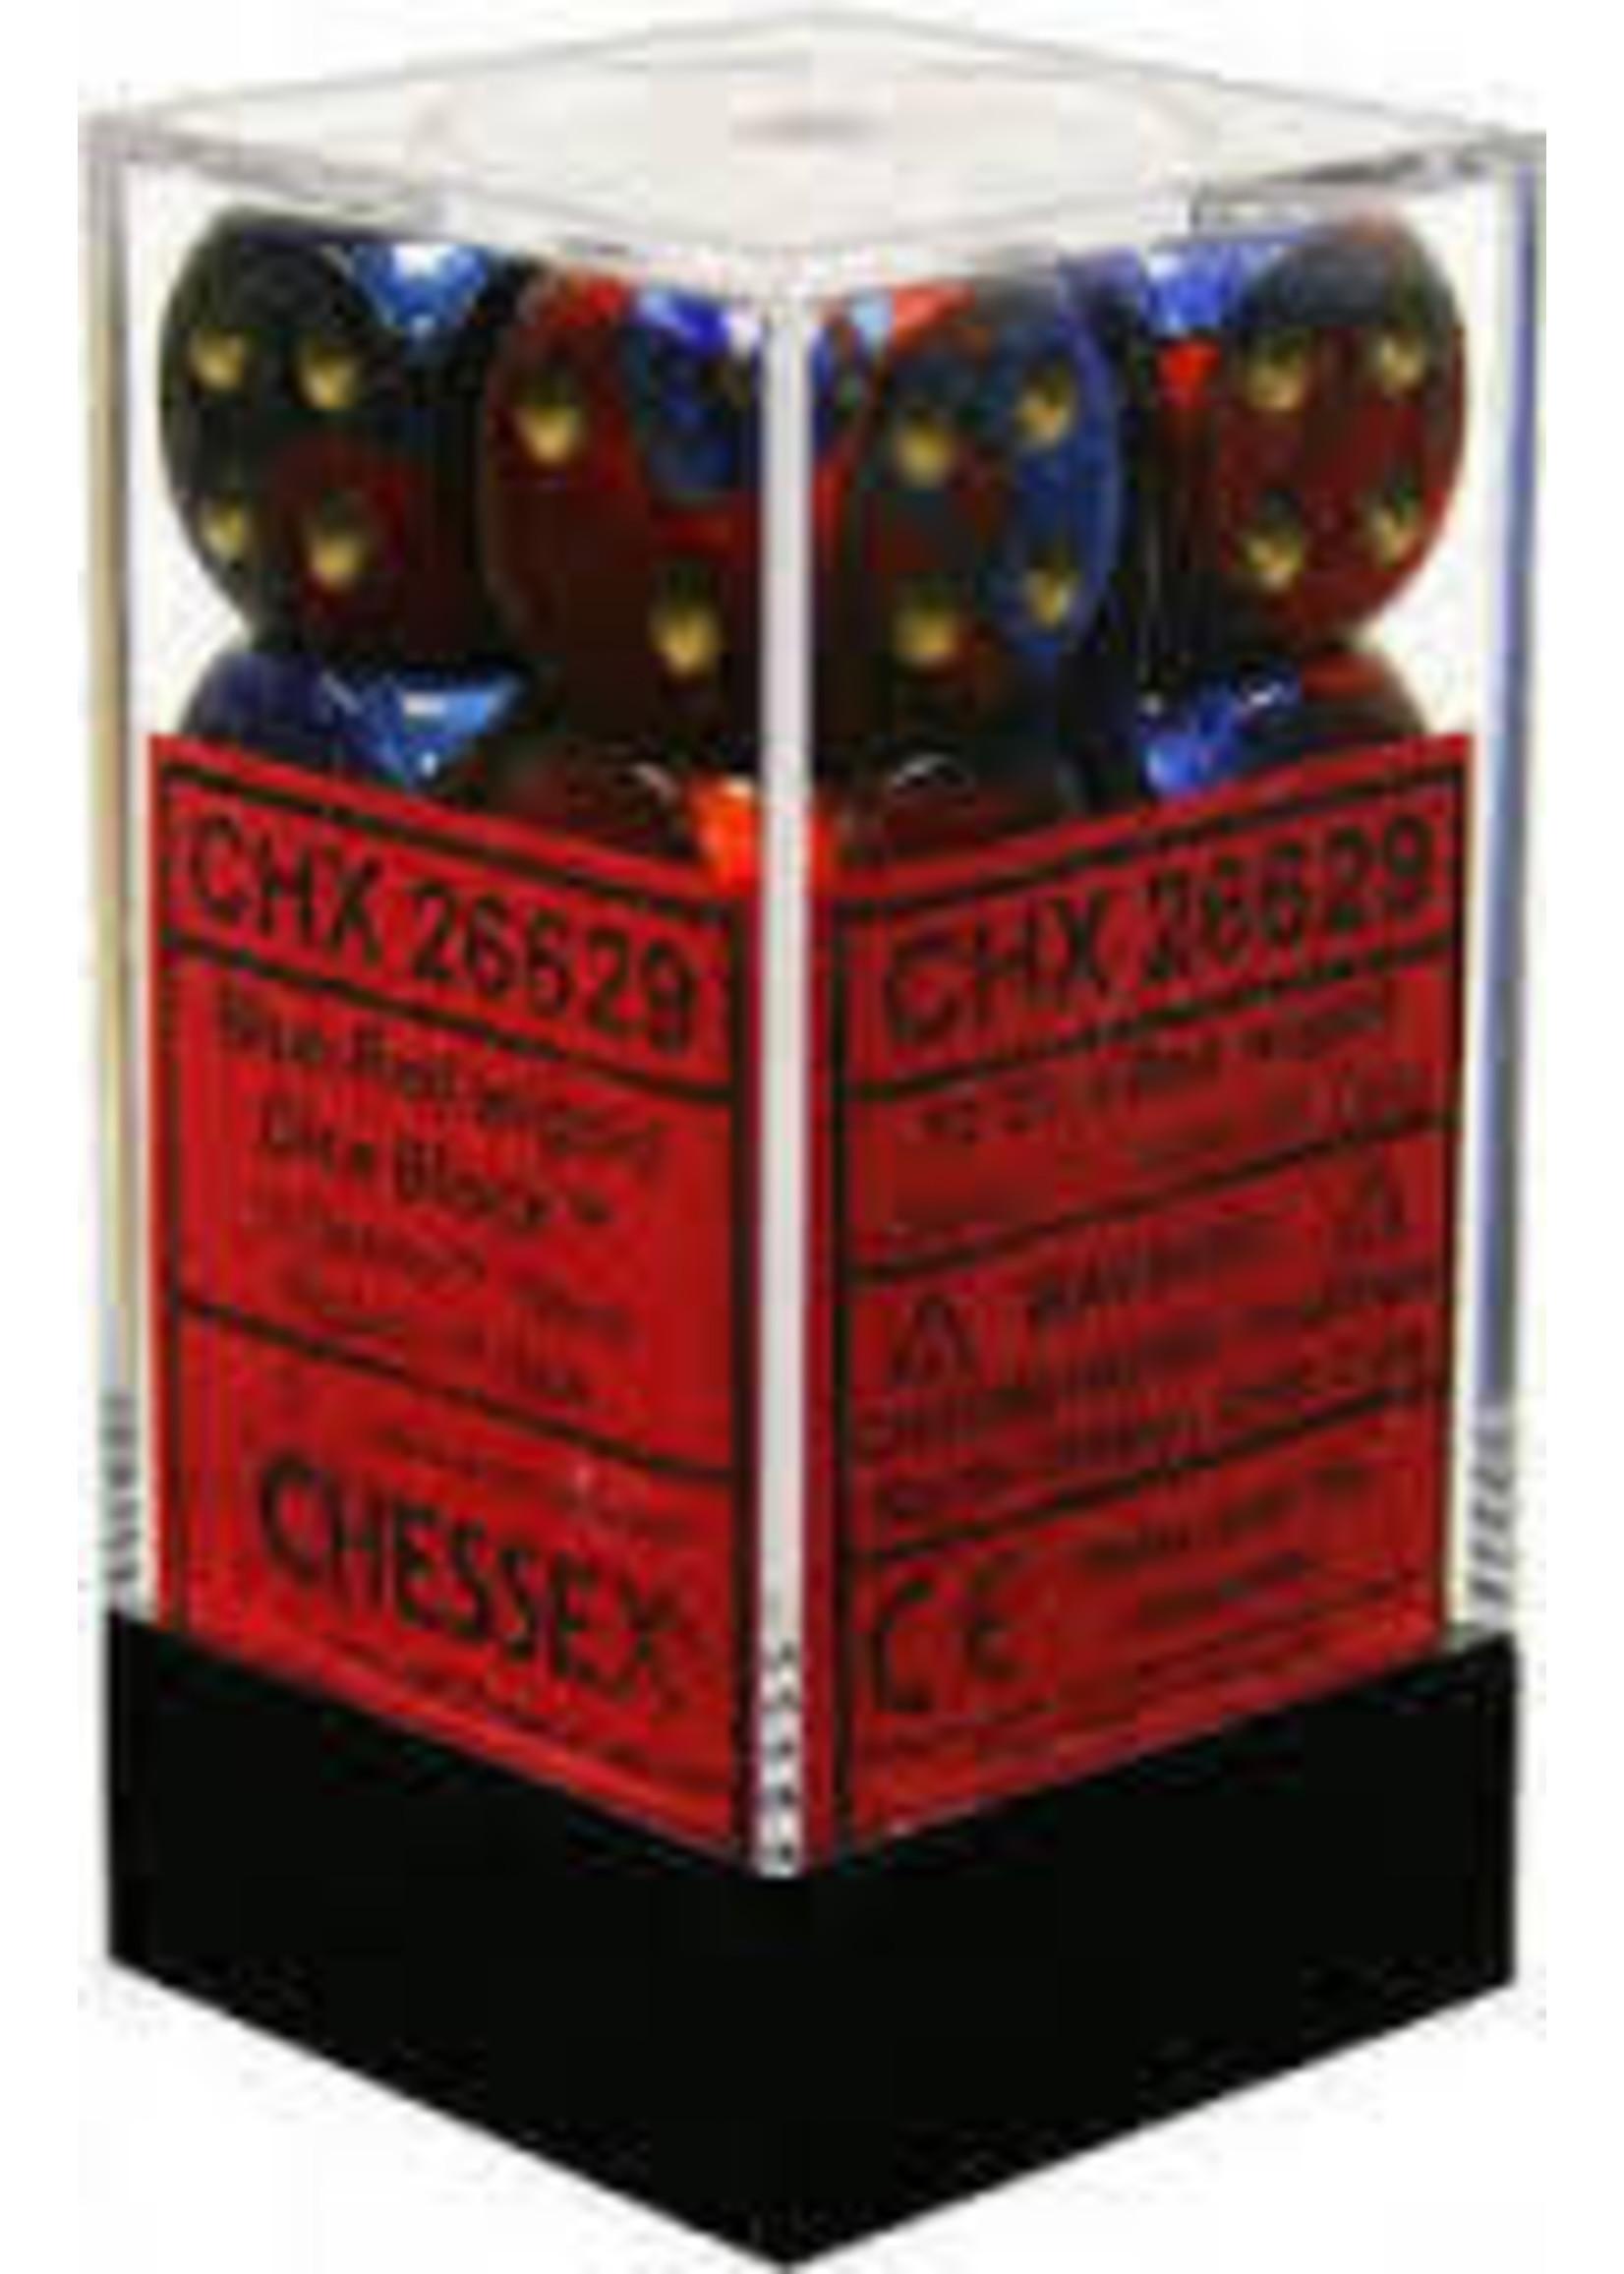 Chessex d6 Cube 16mm Gemini Blue & Red w/ Gold (12)